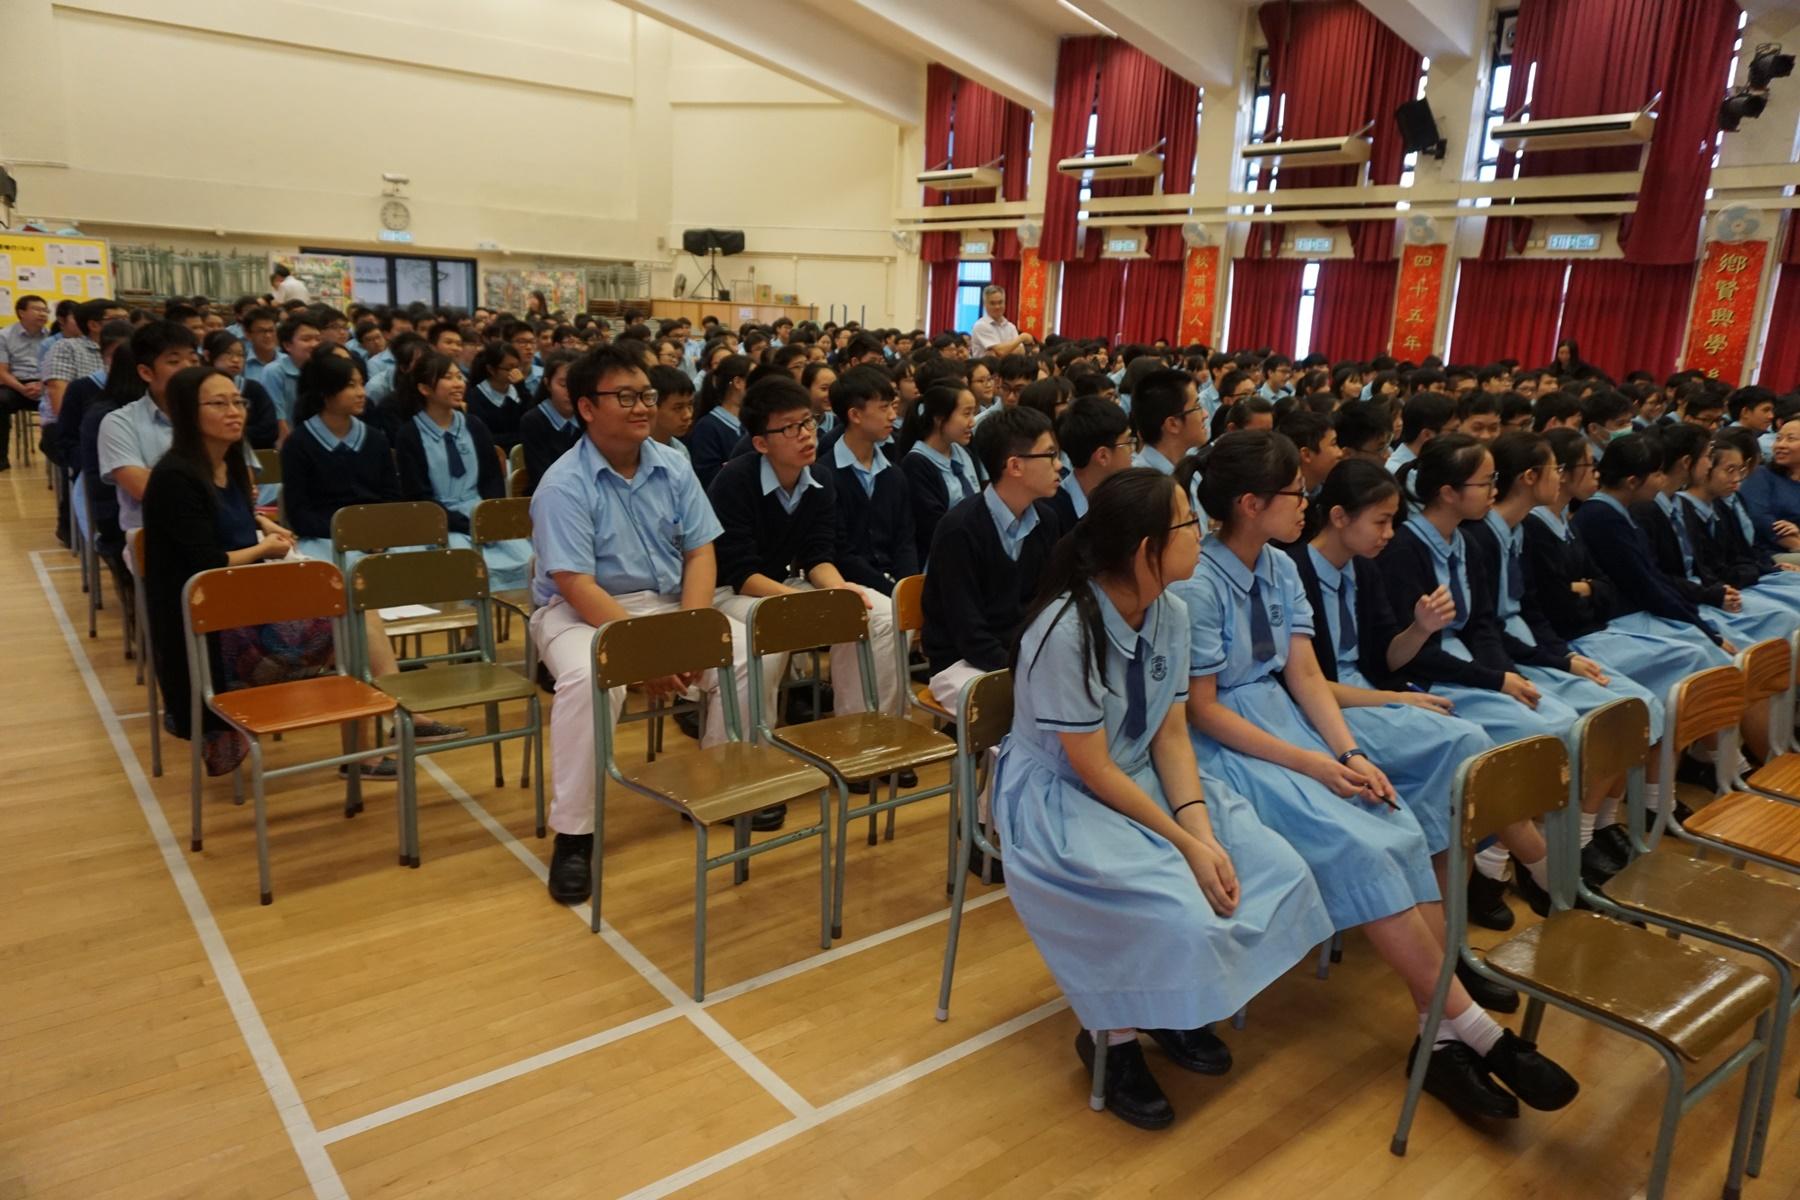 http://npc.edu.hk/sites/default/files/dsc04051.jpg